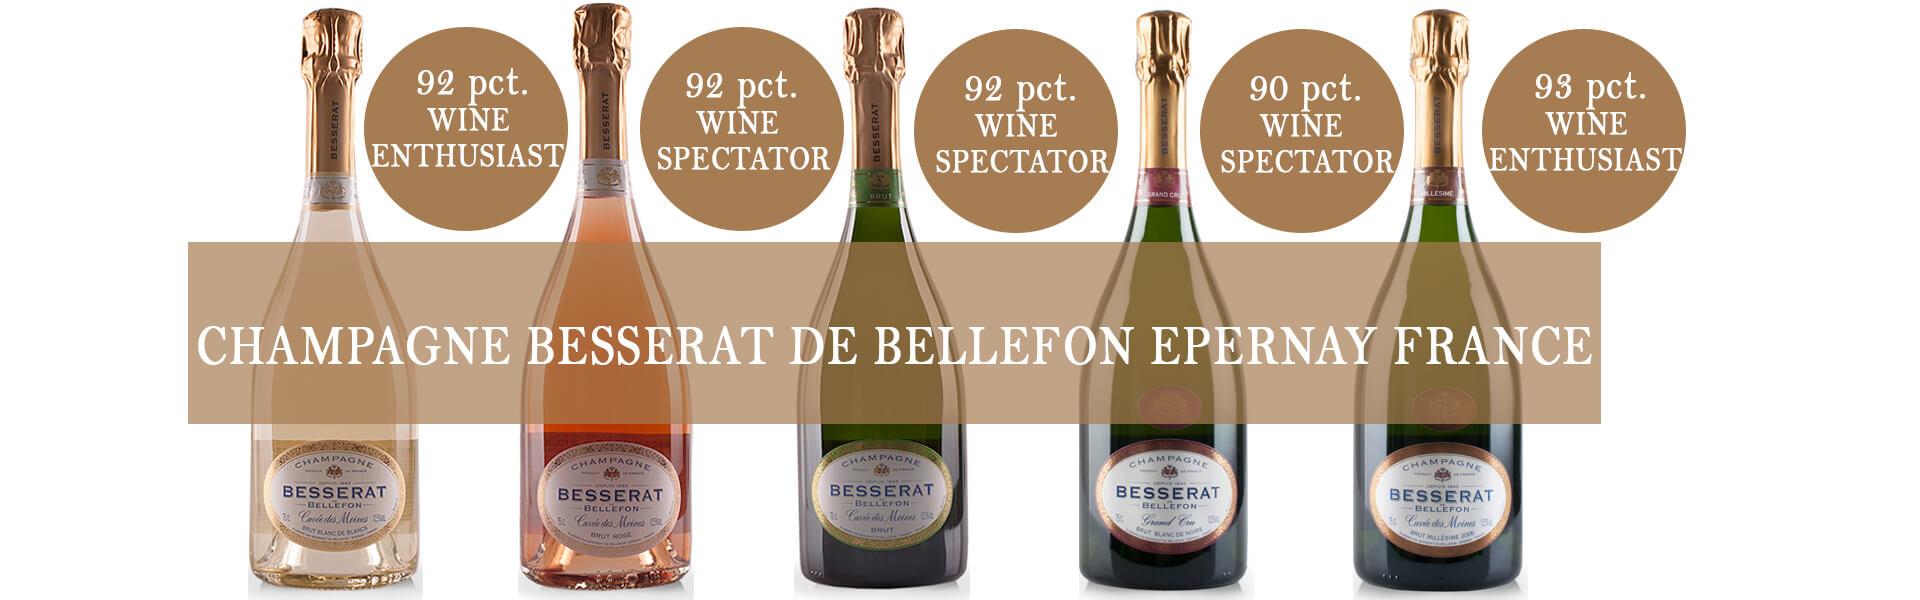 Banner Champagne Besserat de Bellefon